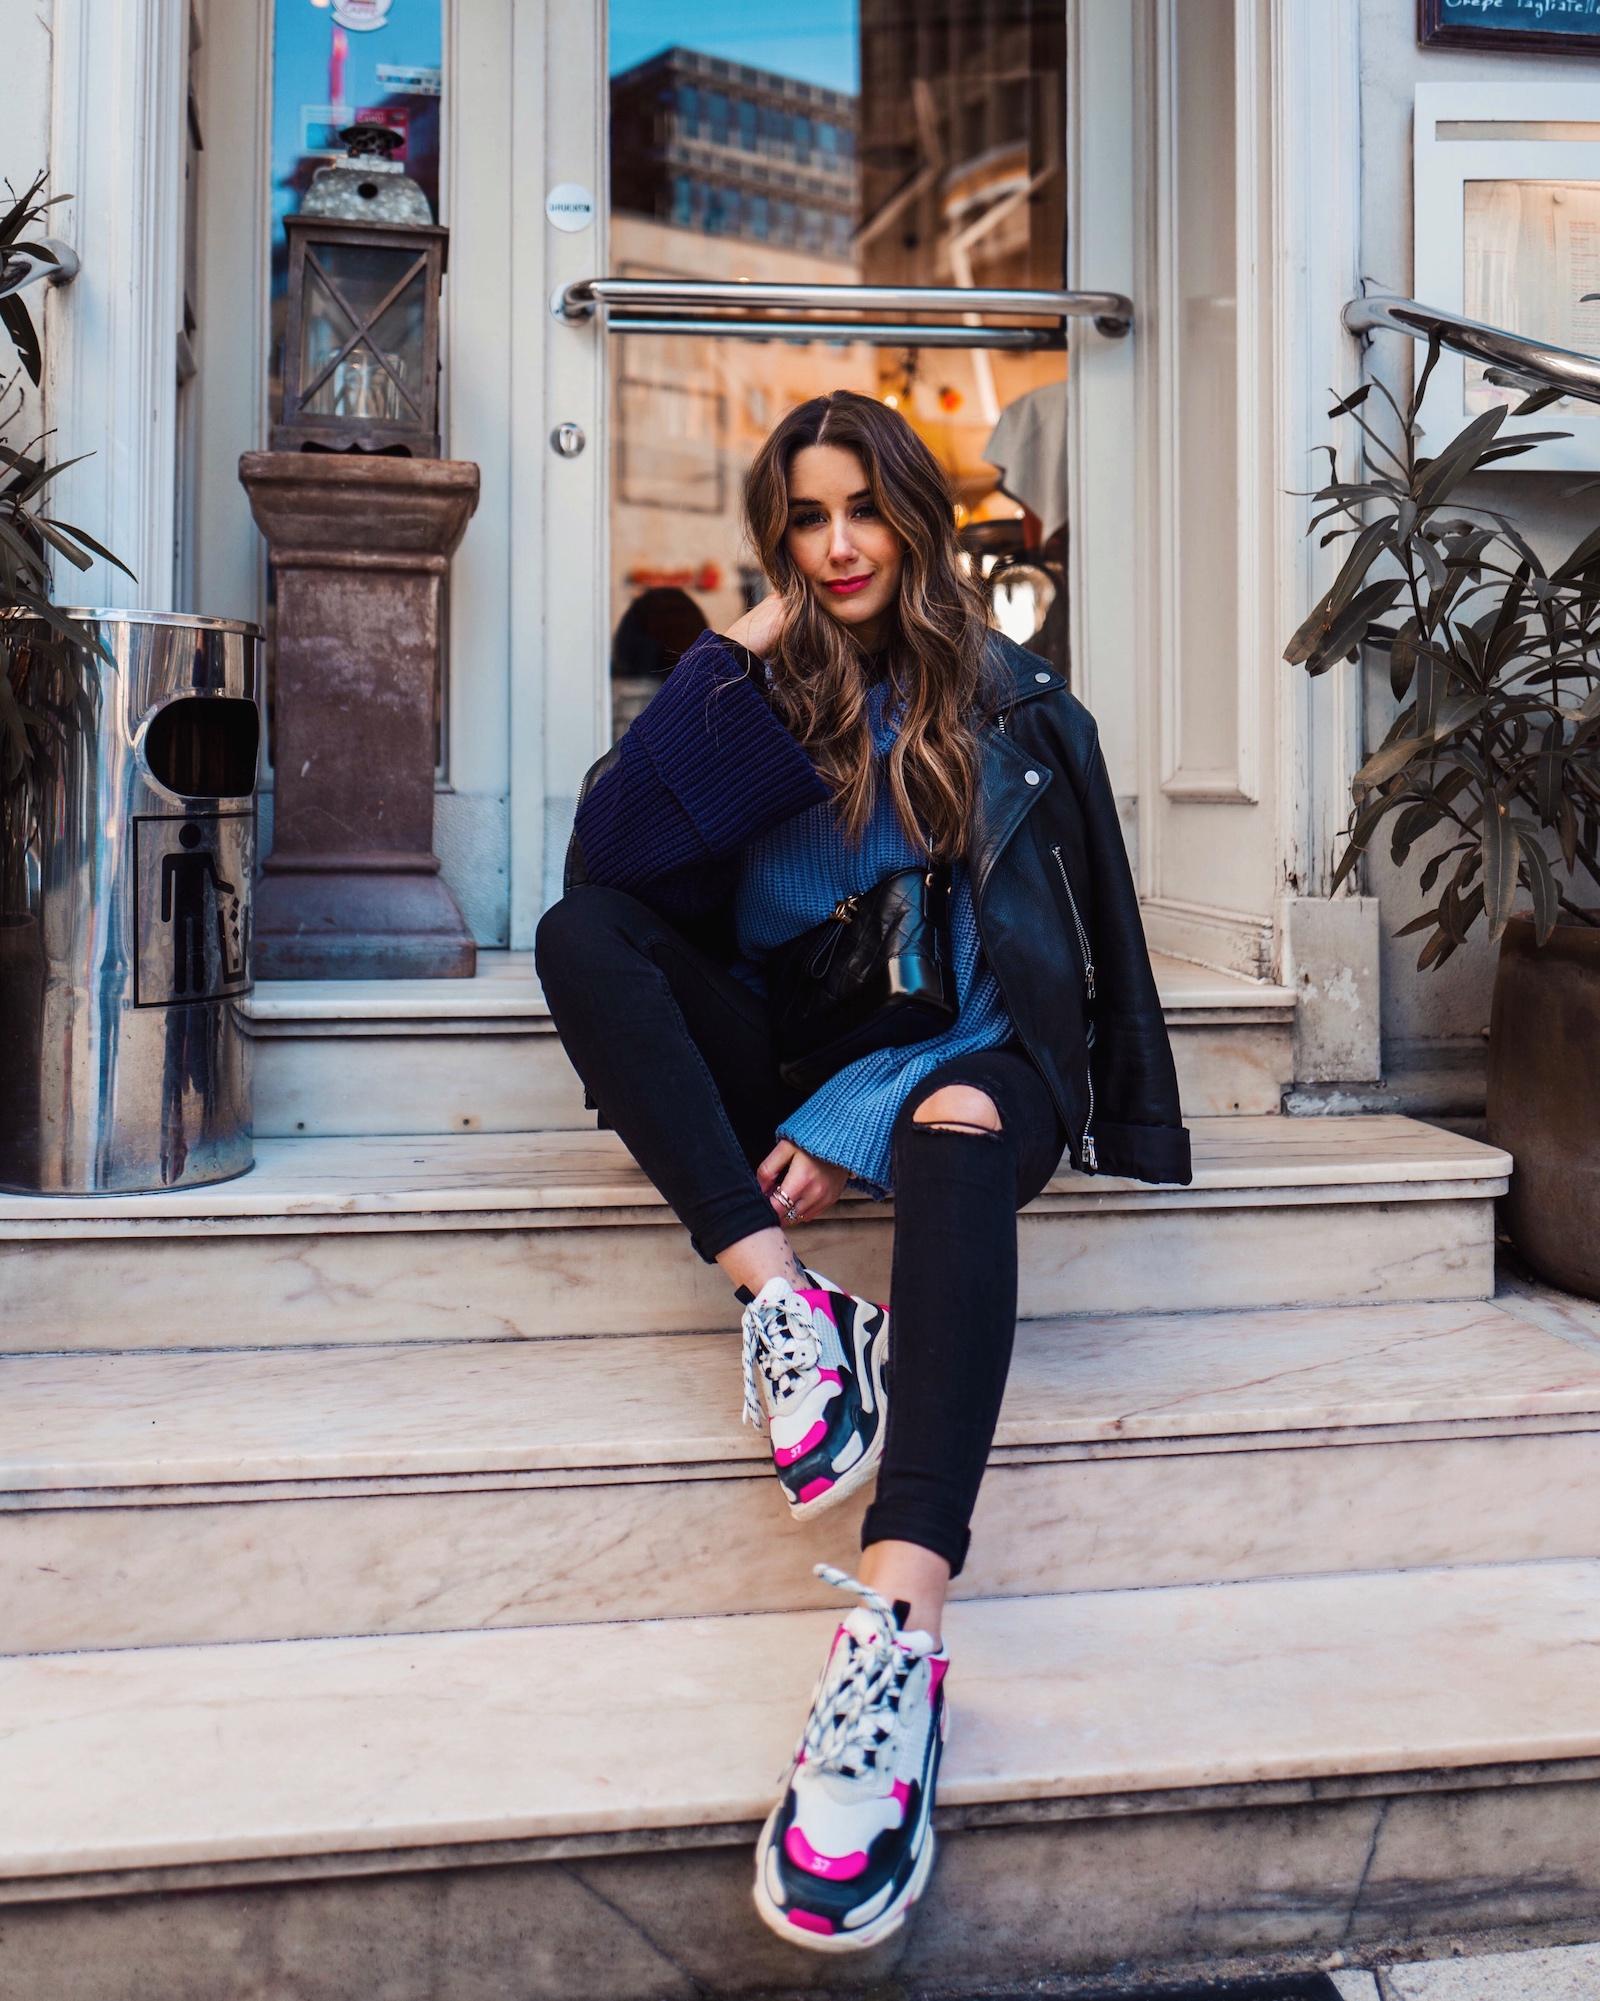 Fab4mag_blogazine_fashion_janina-who_3.jpg